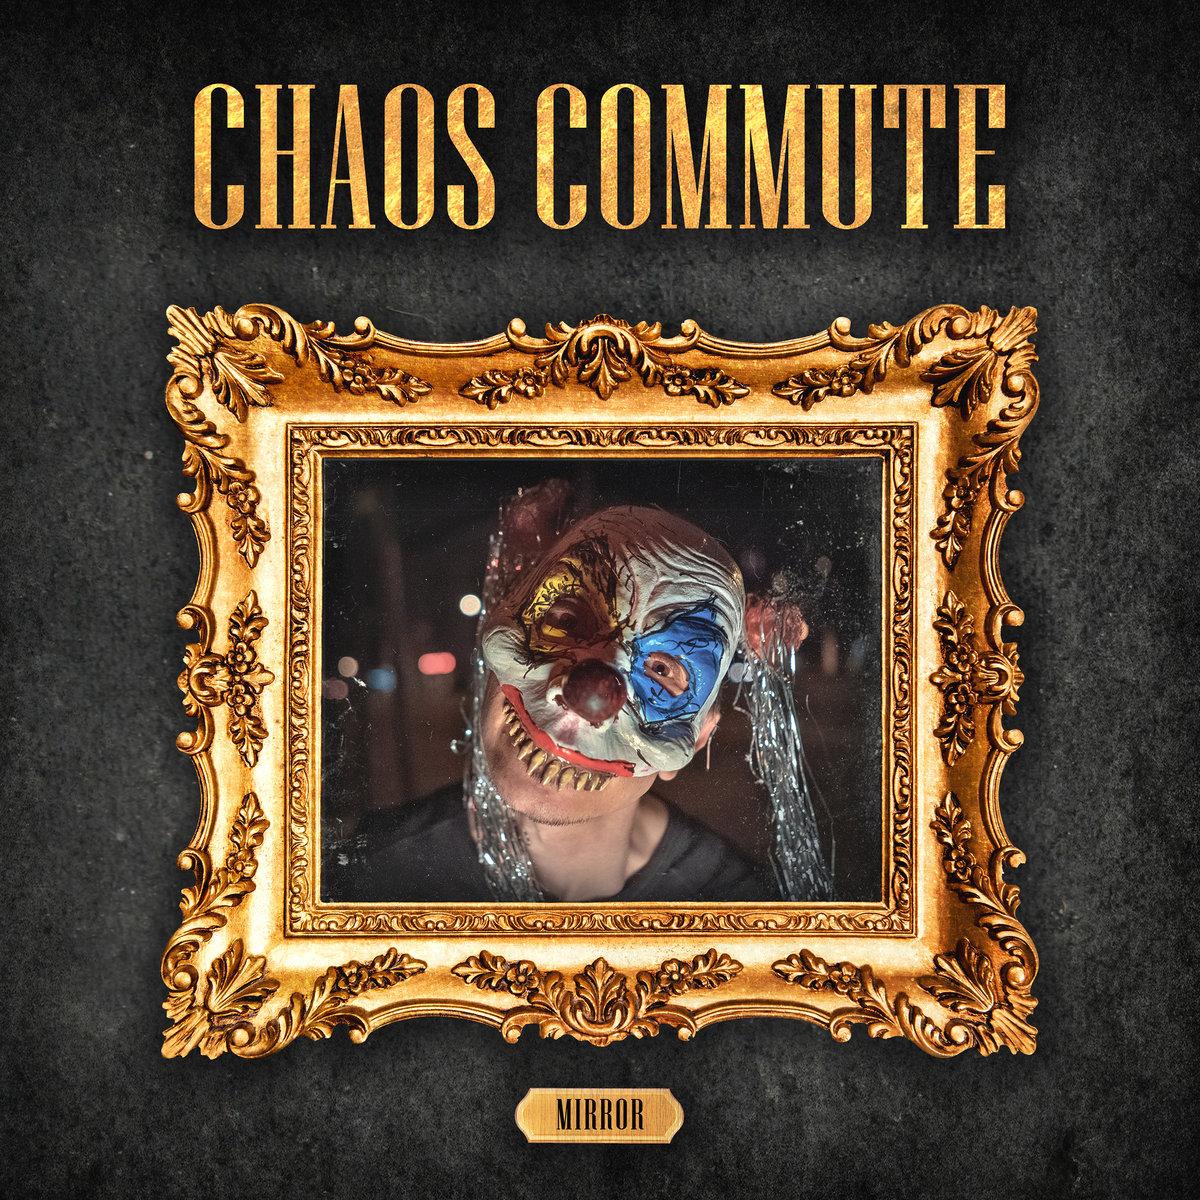 Chaos Commute